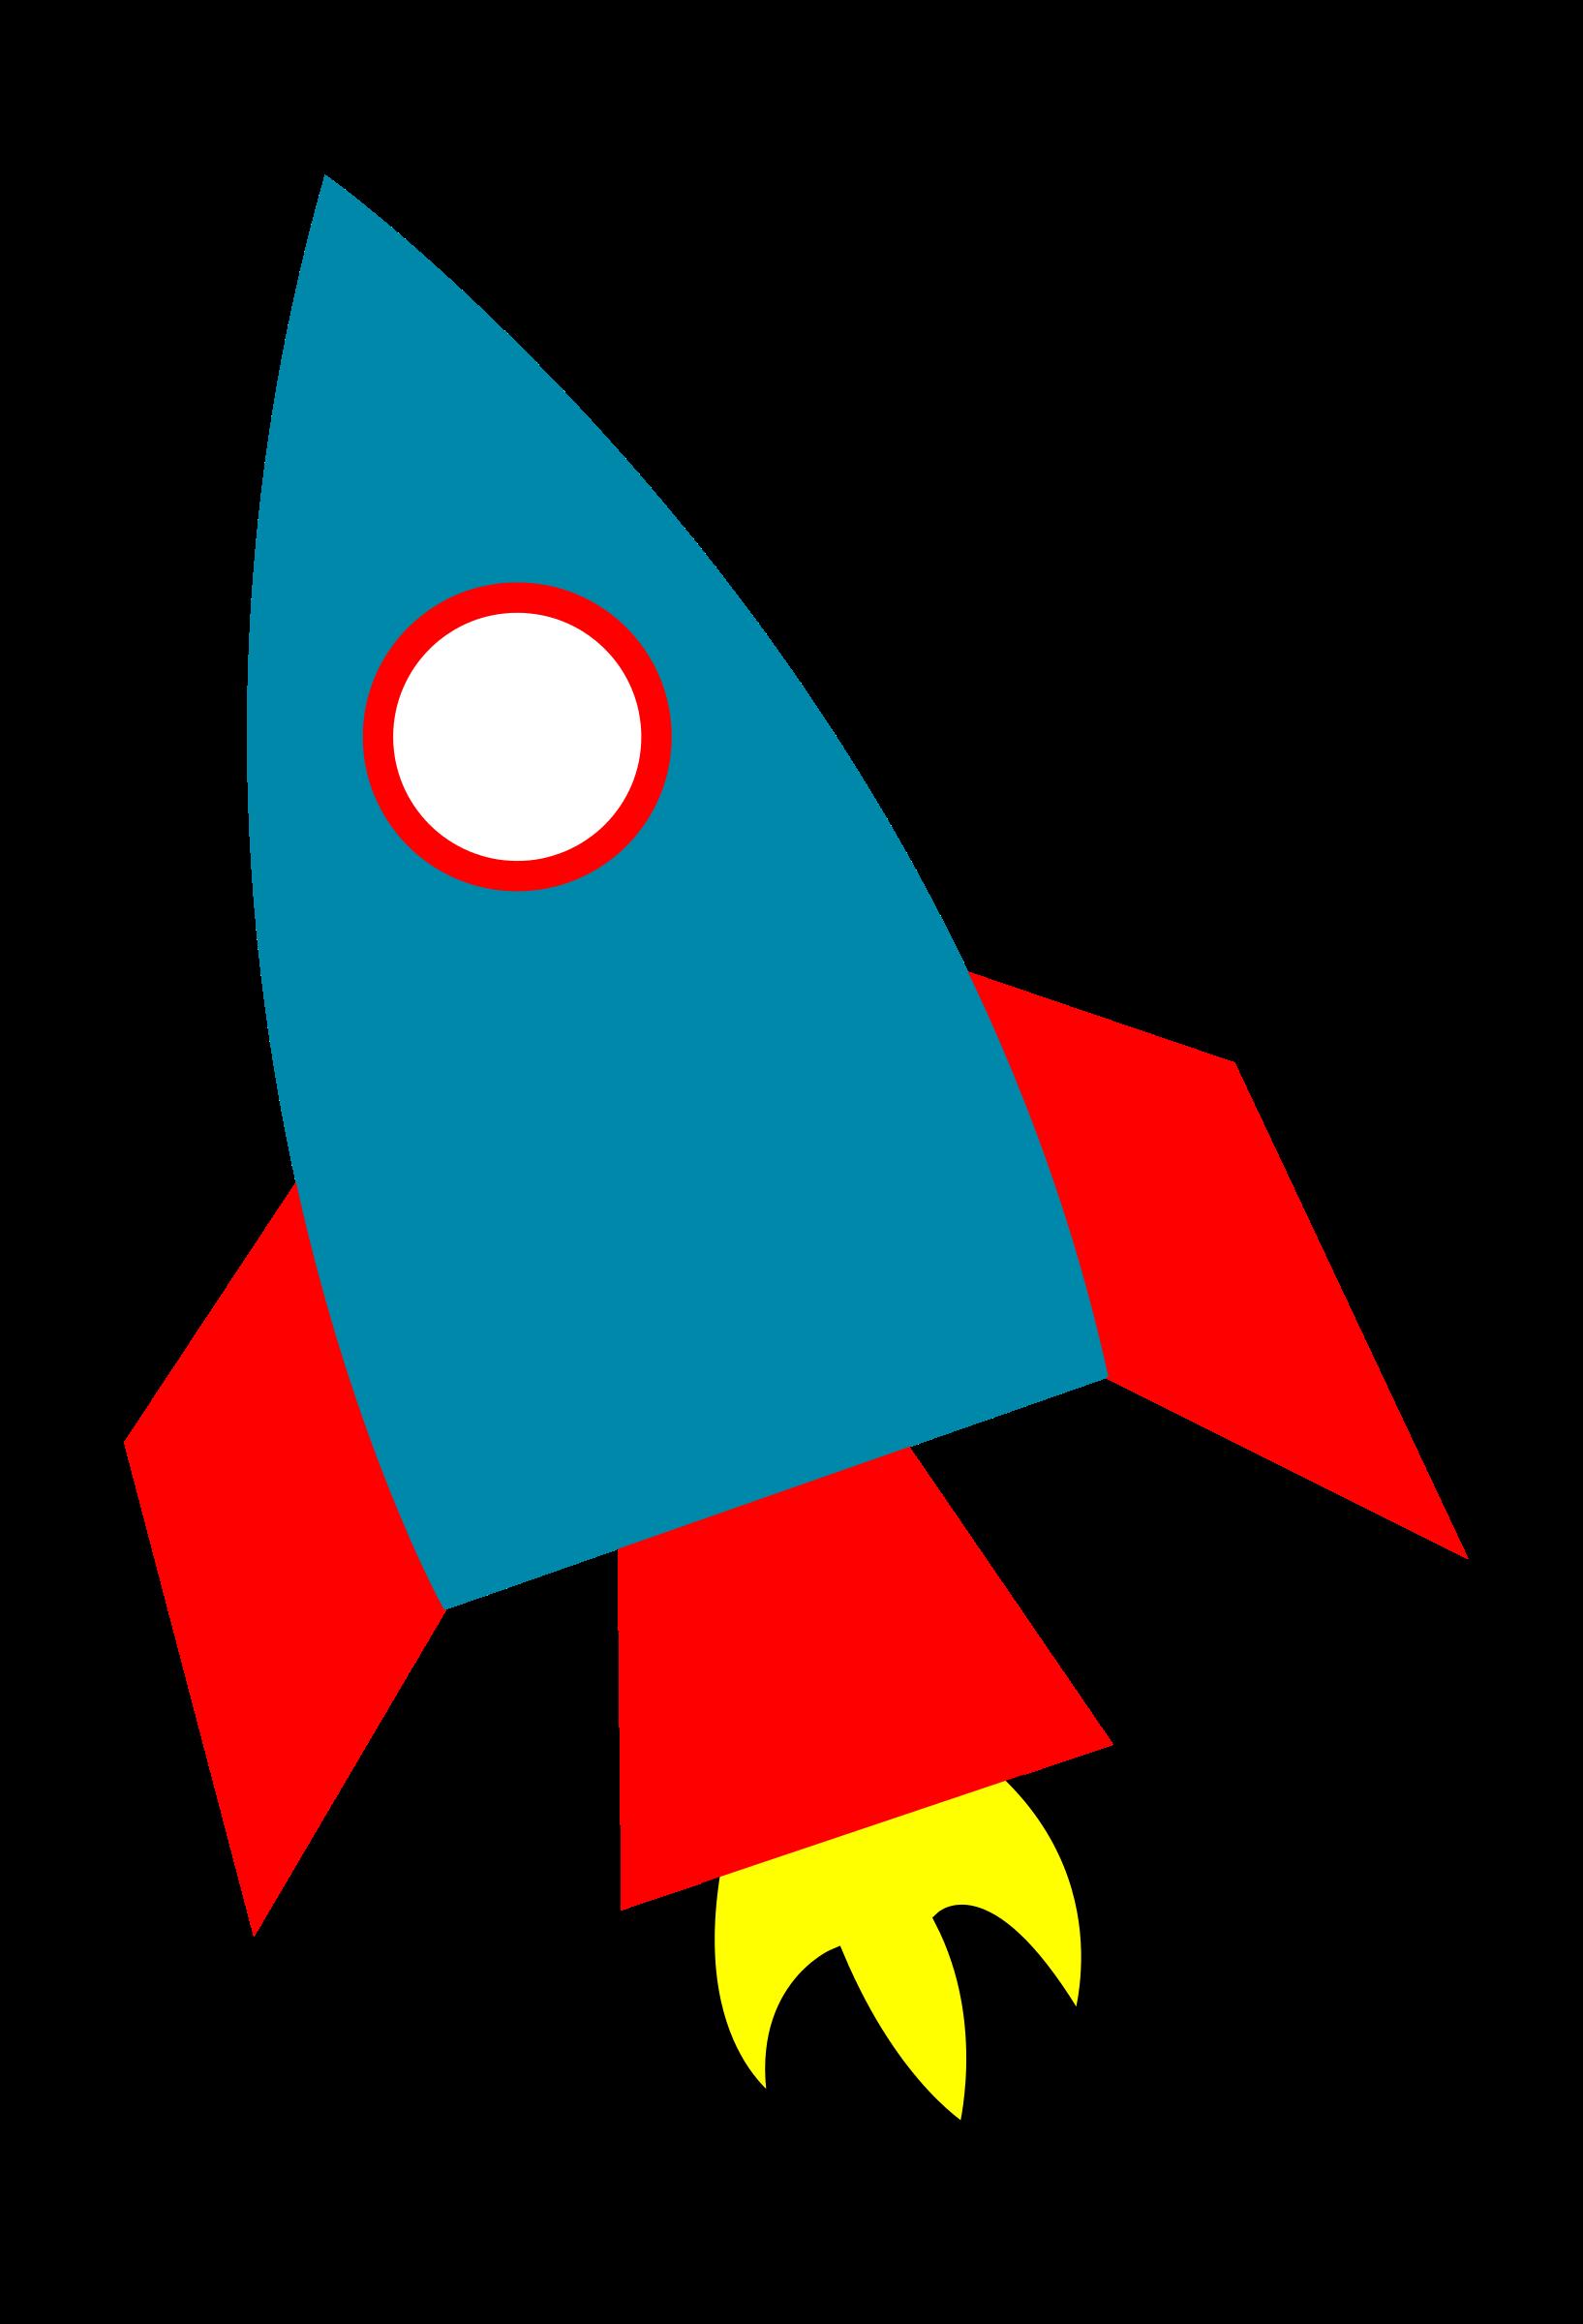 Rocket clip art clipart image 2